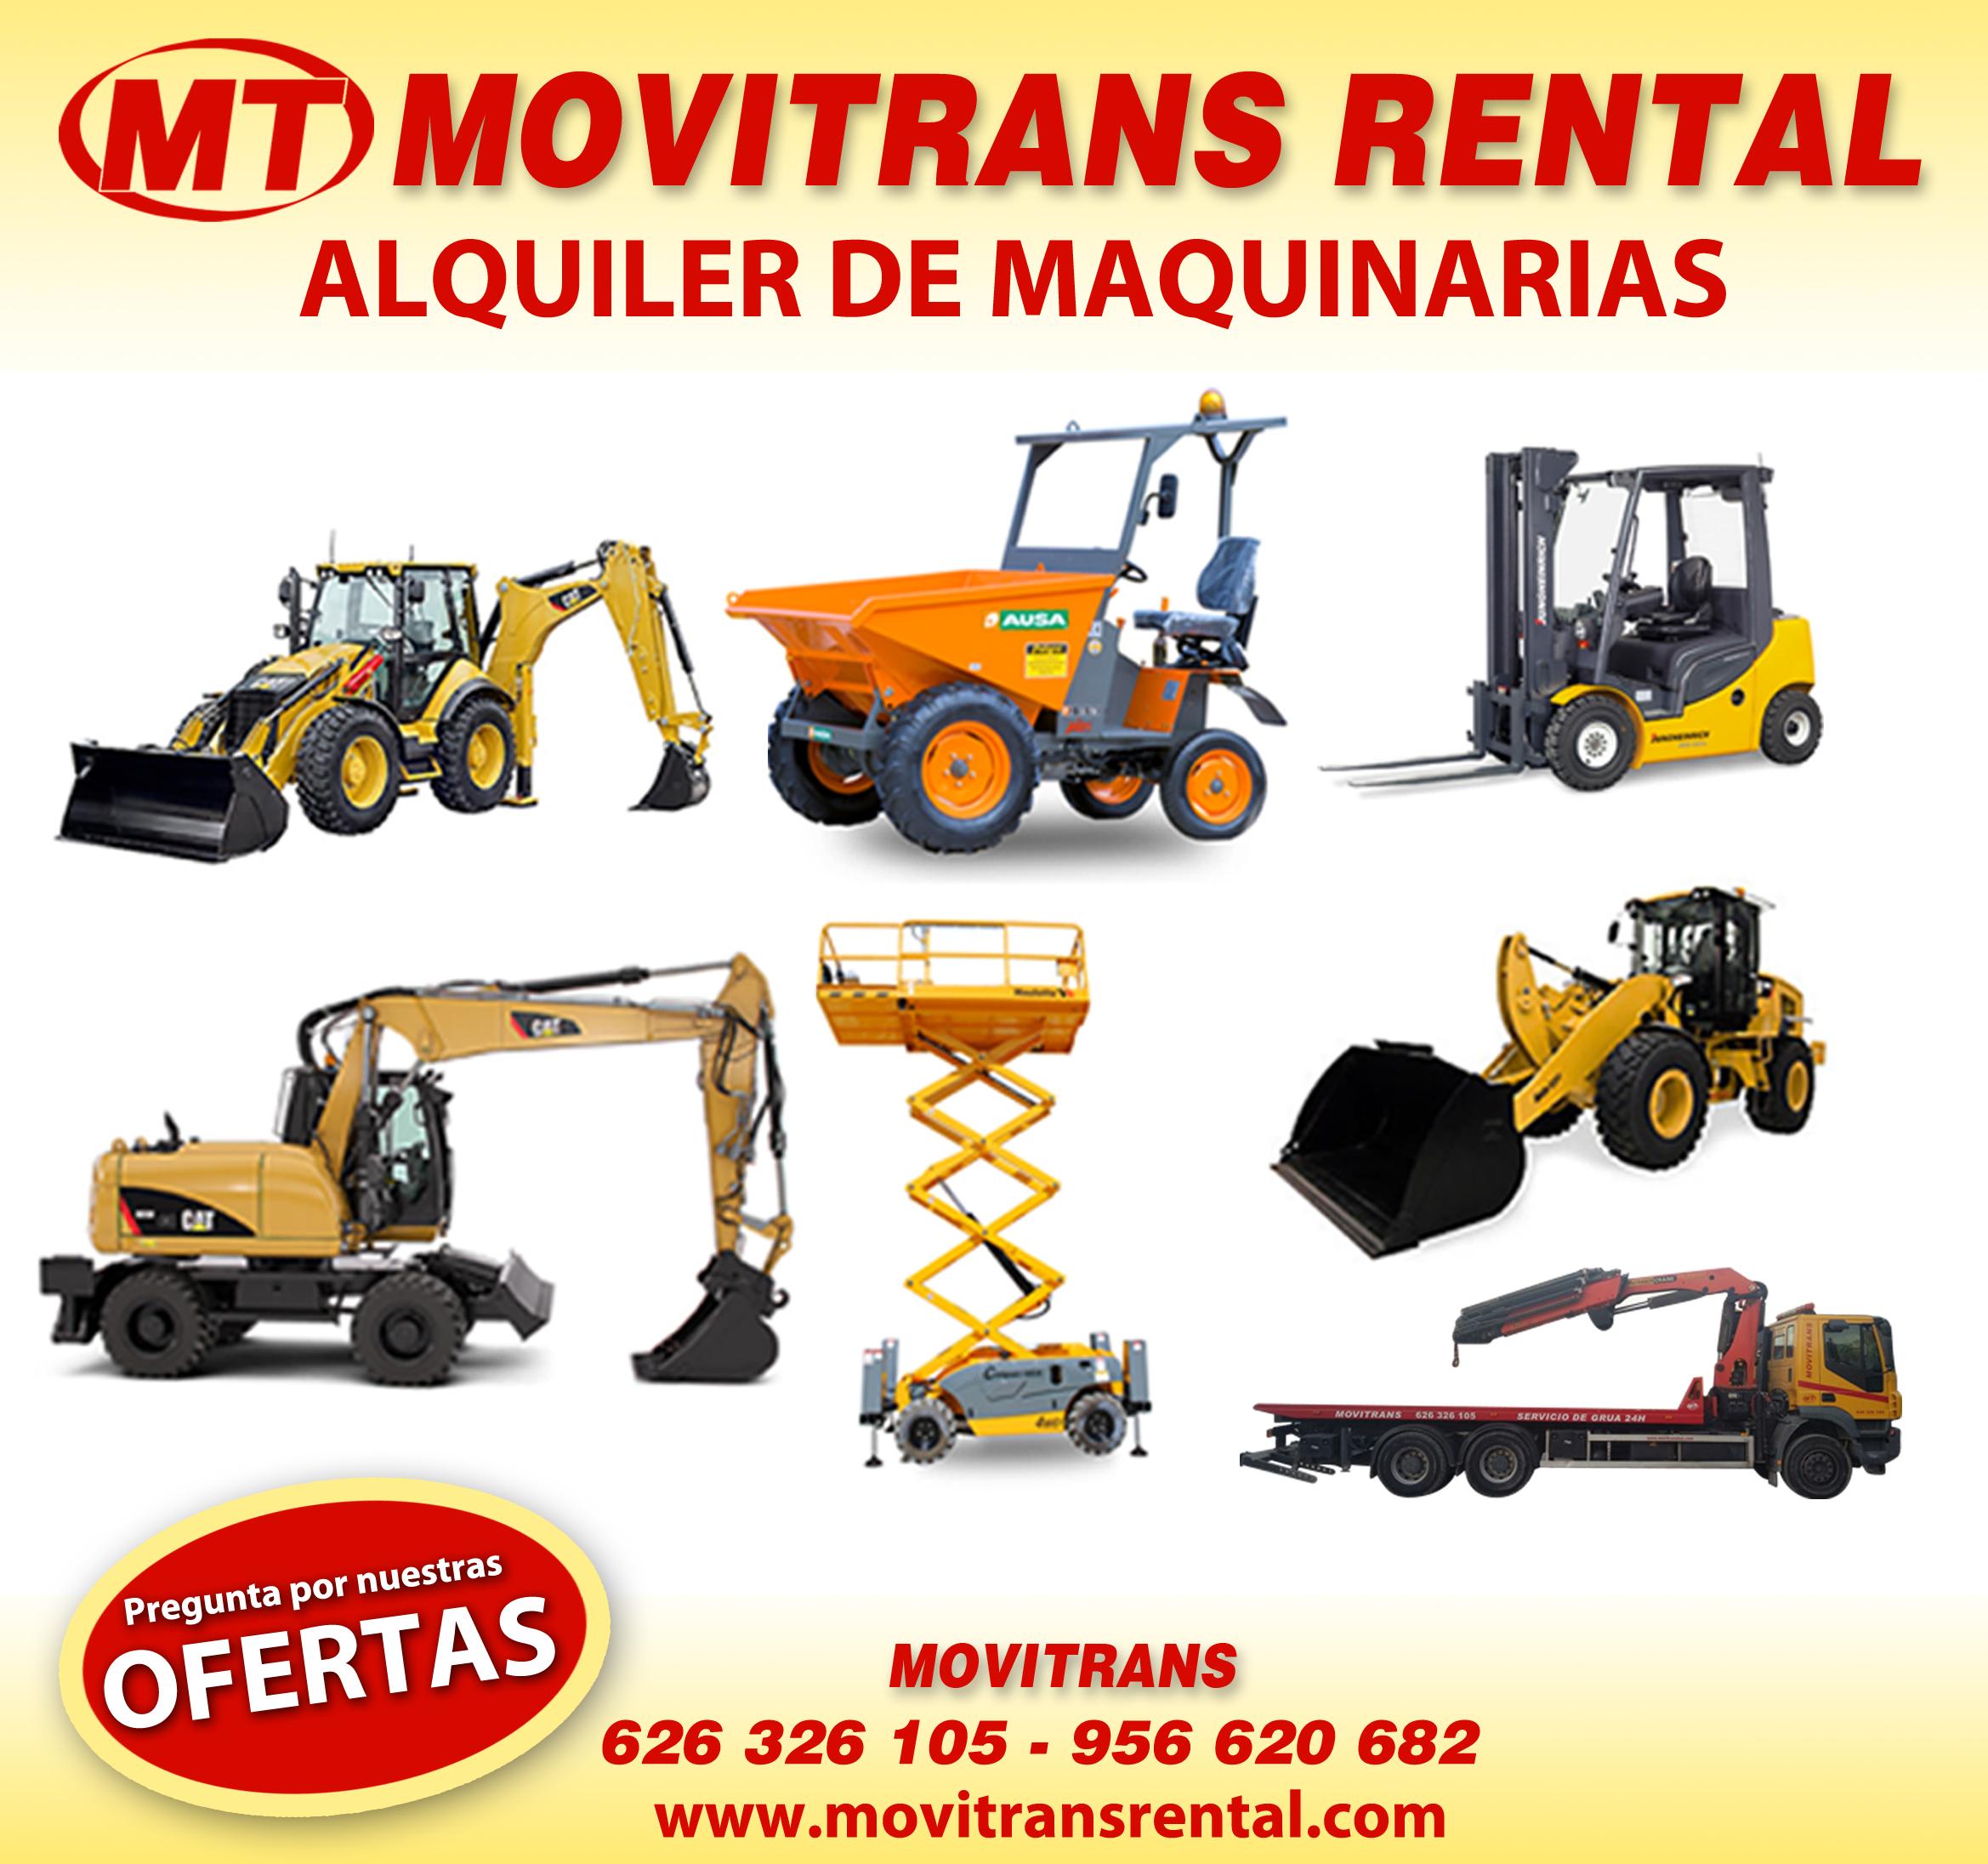 Movitrans Rental Alquiler Maquinaria Cádiz